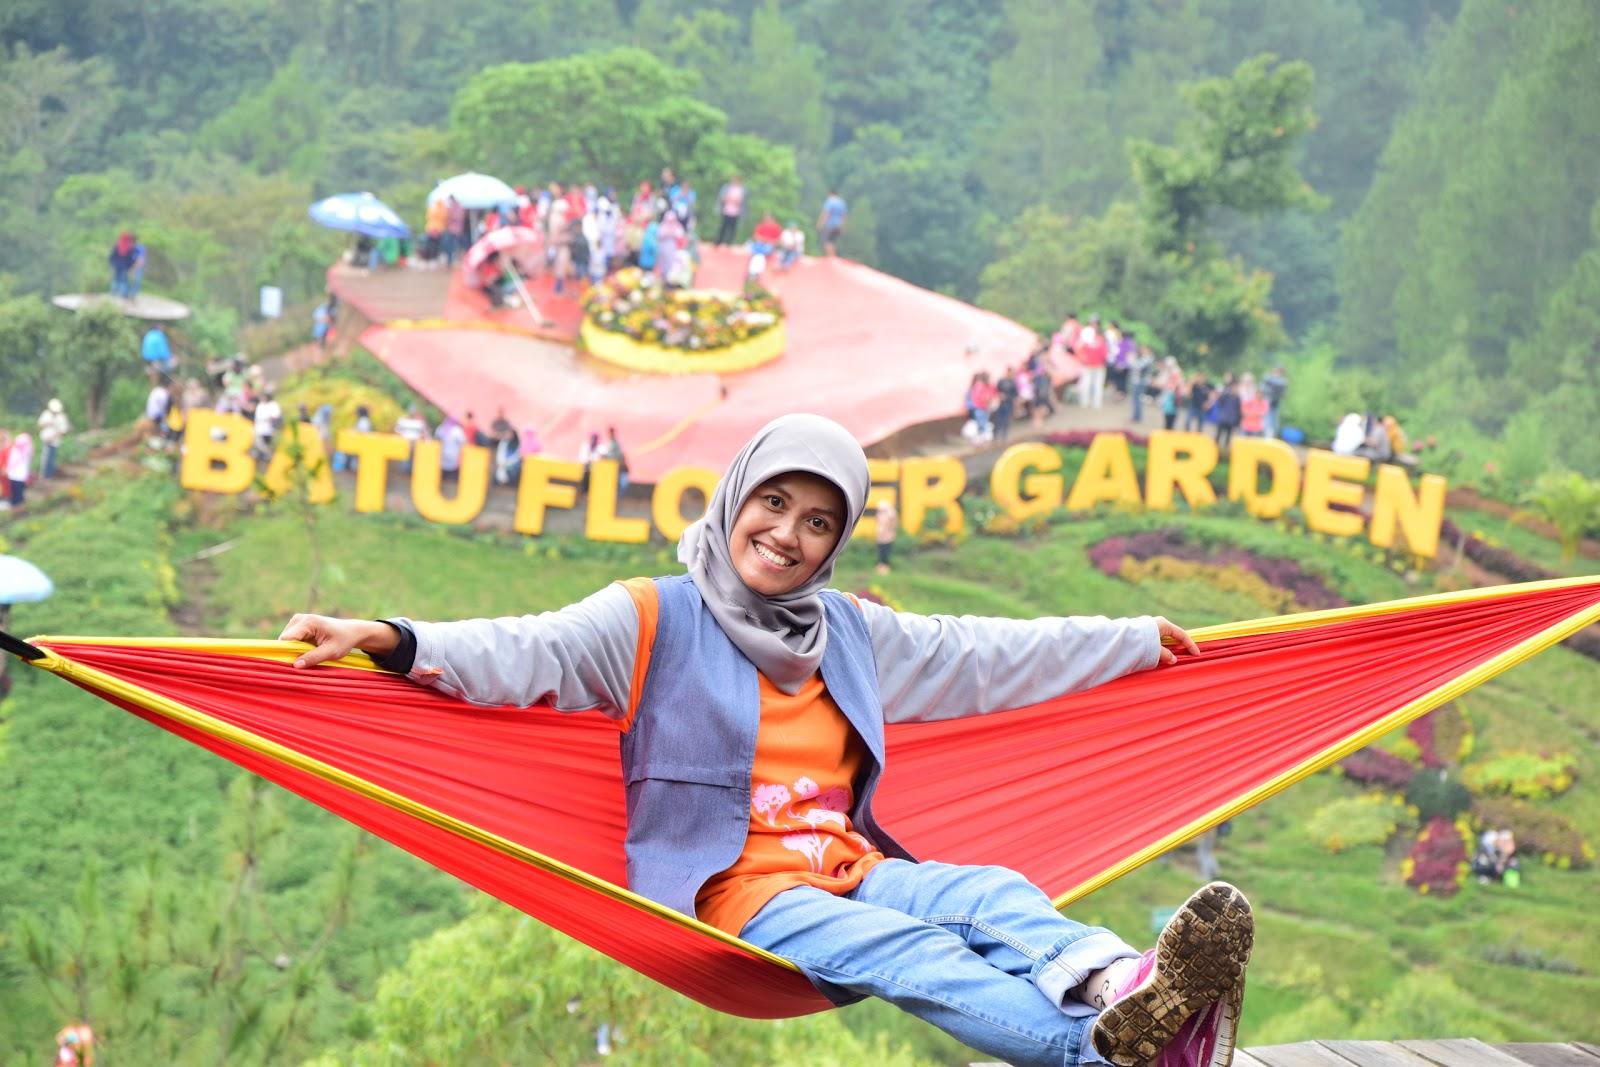 Reni Dwi Astuti Eksotisme Batu Flower Garden Di Wana Wisata Coban Rais